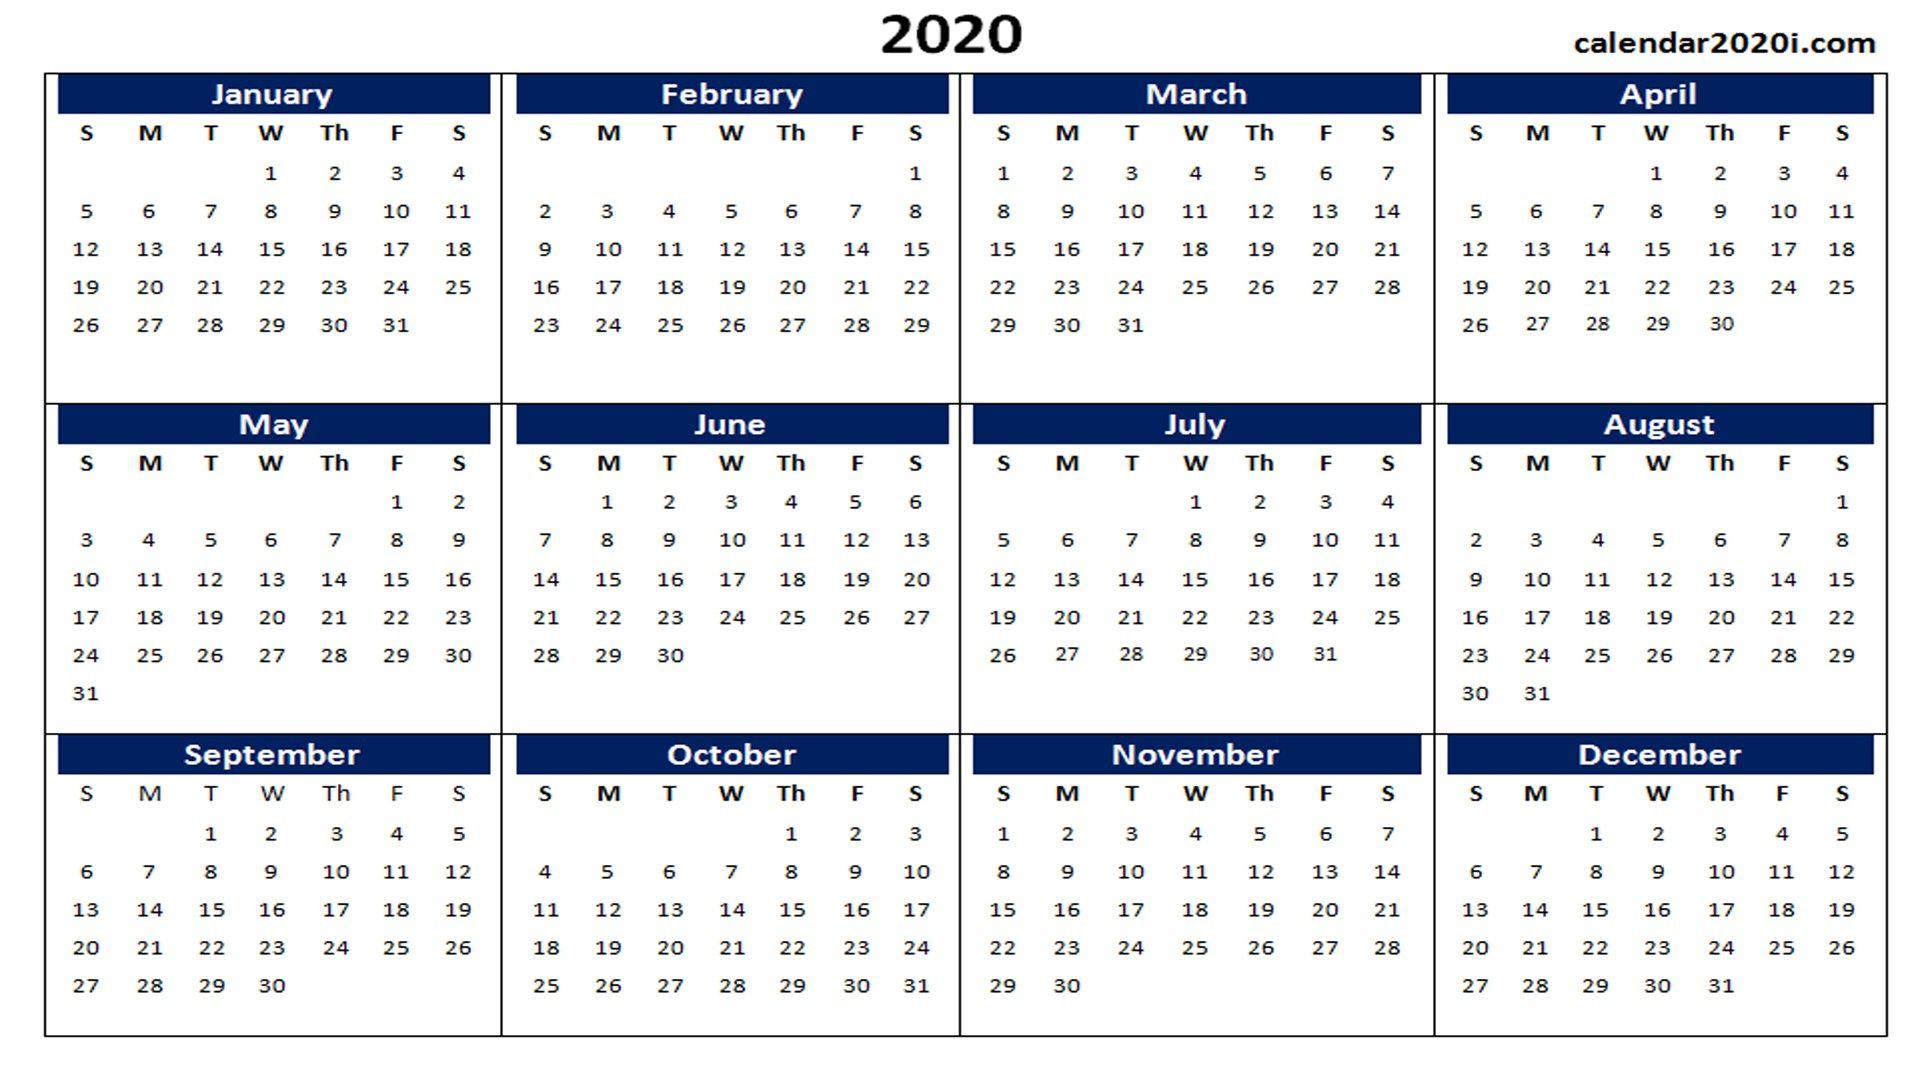 2020 Calendar Printable Template Holidays Word Excel Free Blank Printable Calendar 2020 Templa In 2020 Printable Calendar Word Calendar Word Monthly Calendar Printable